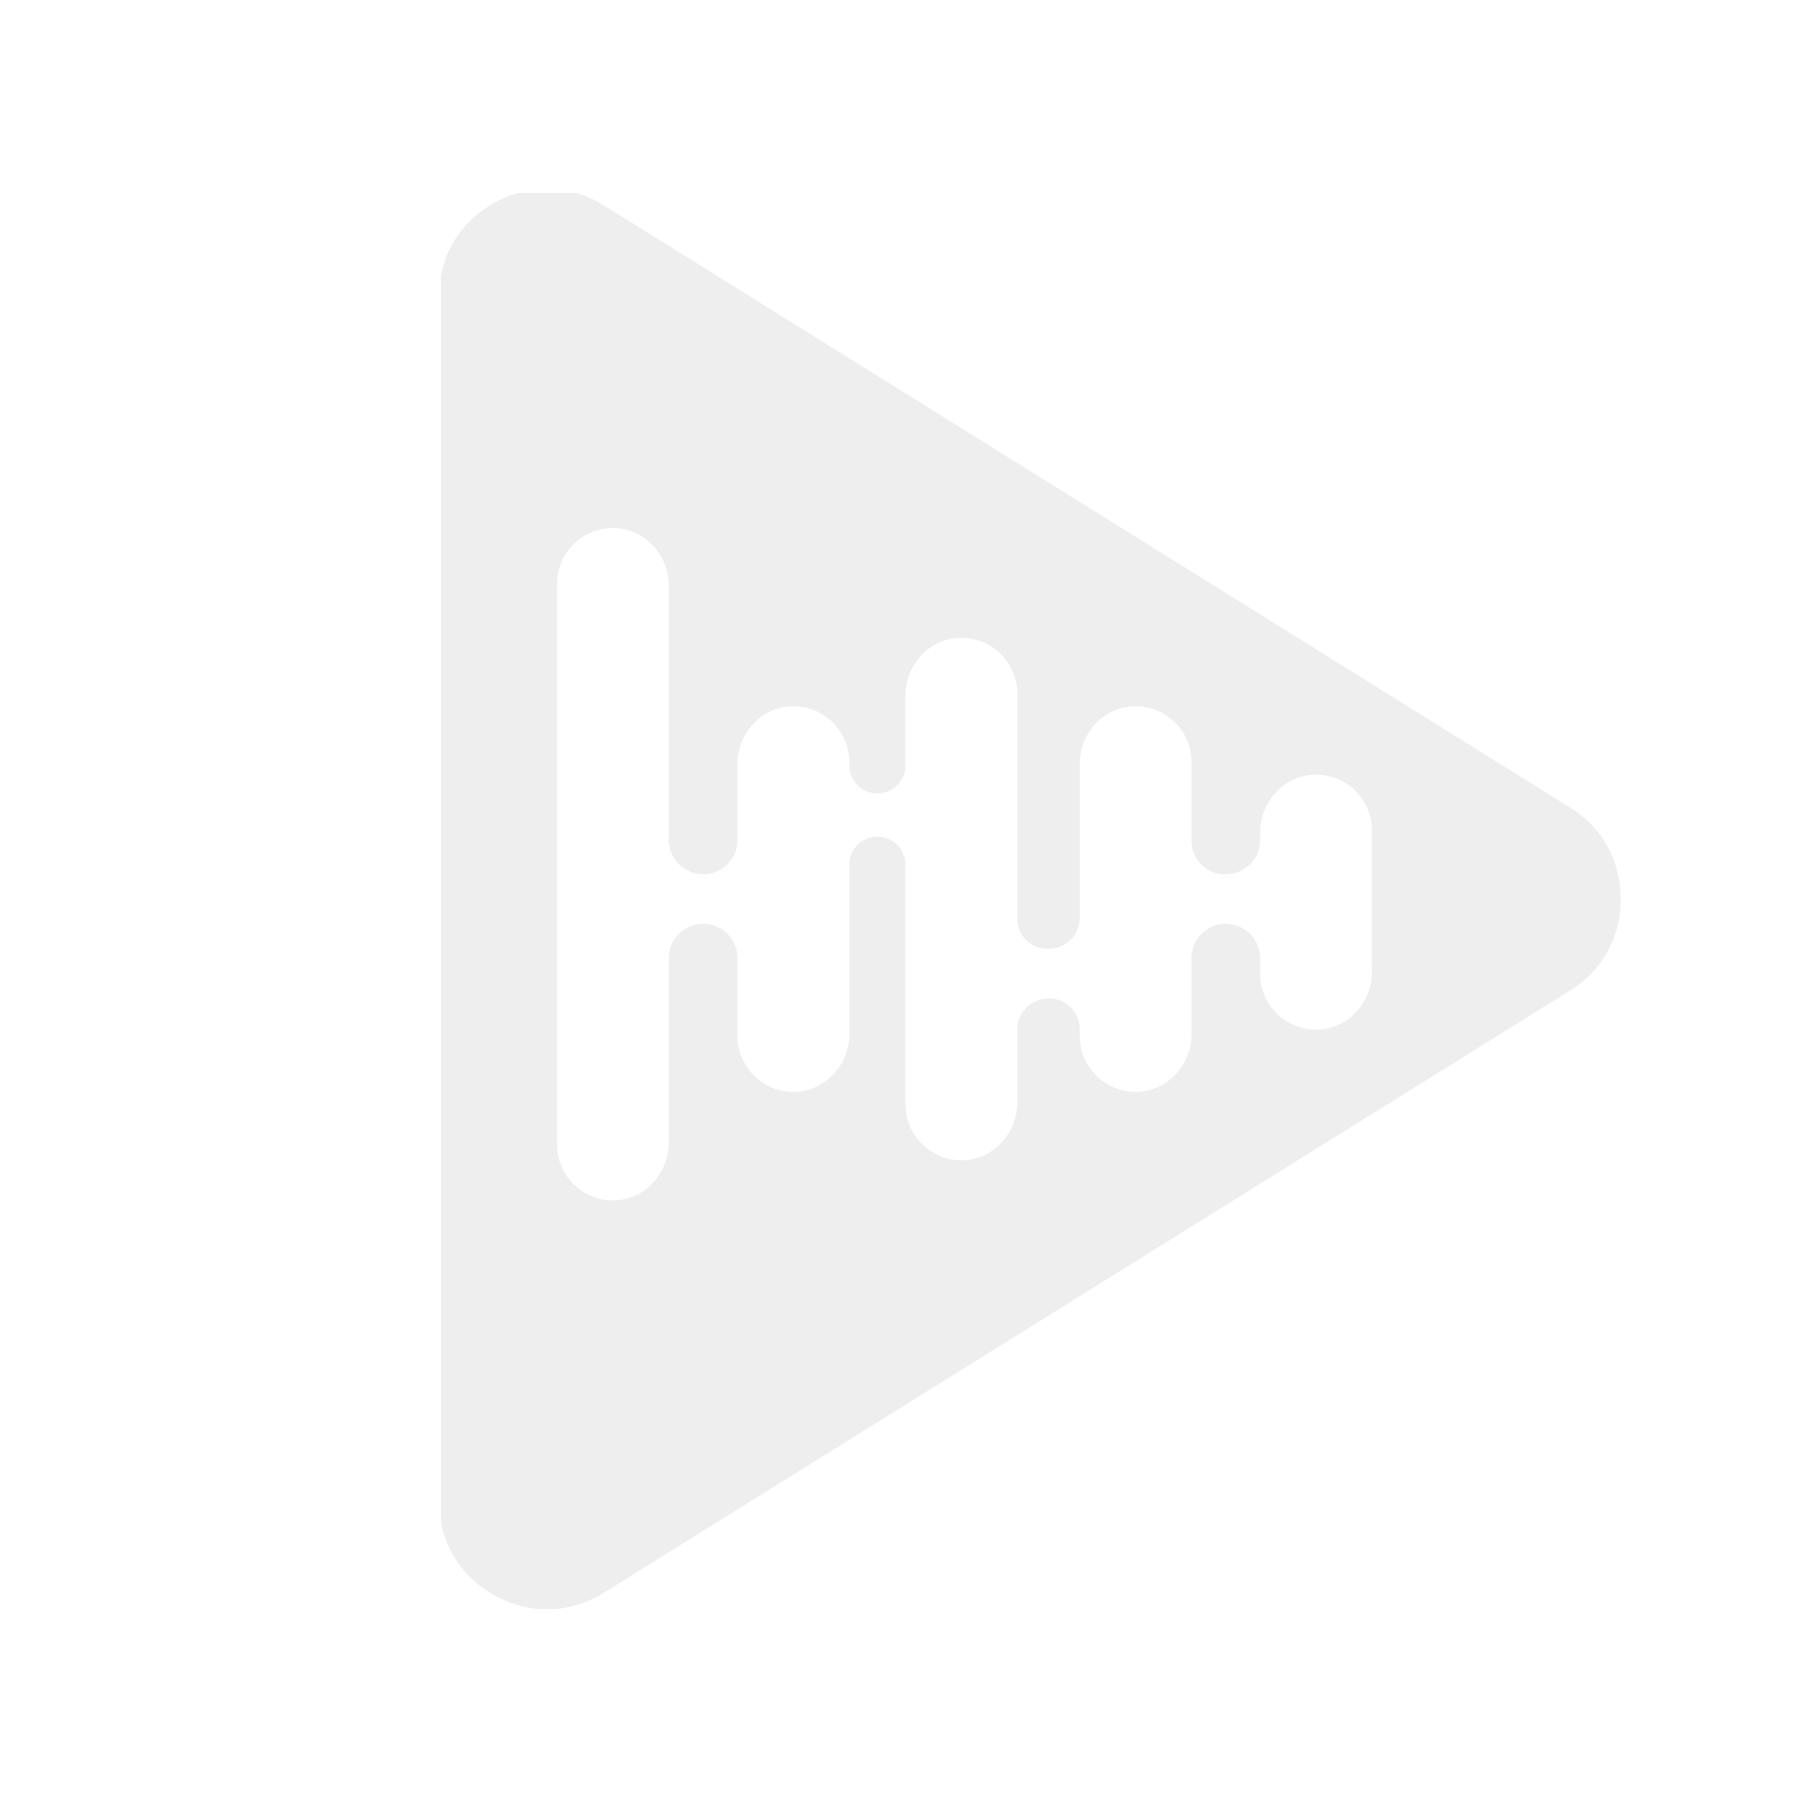 Speedsignal C-3474104